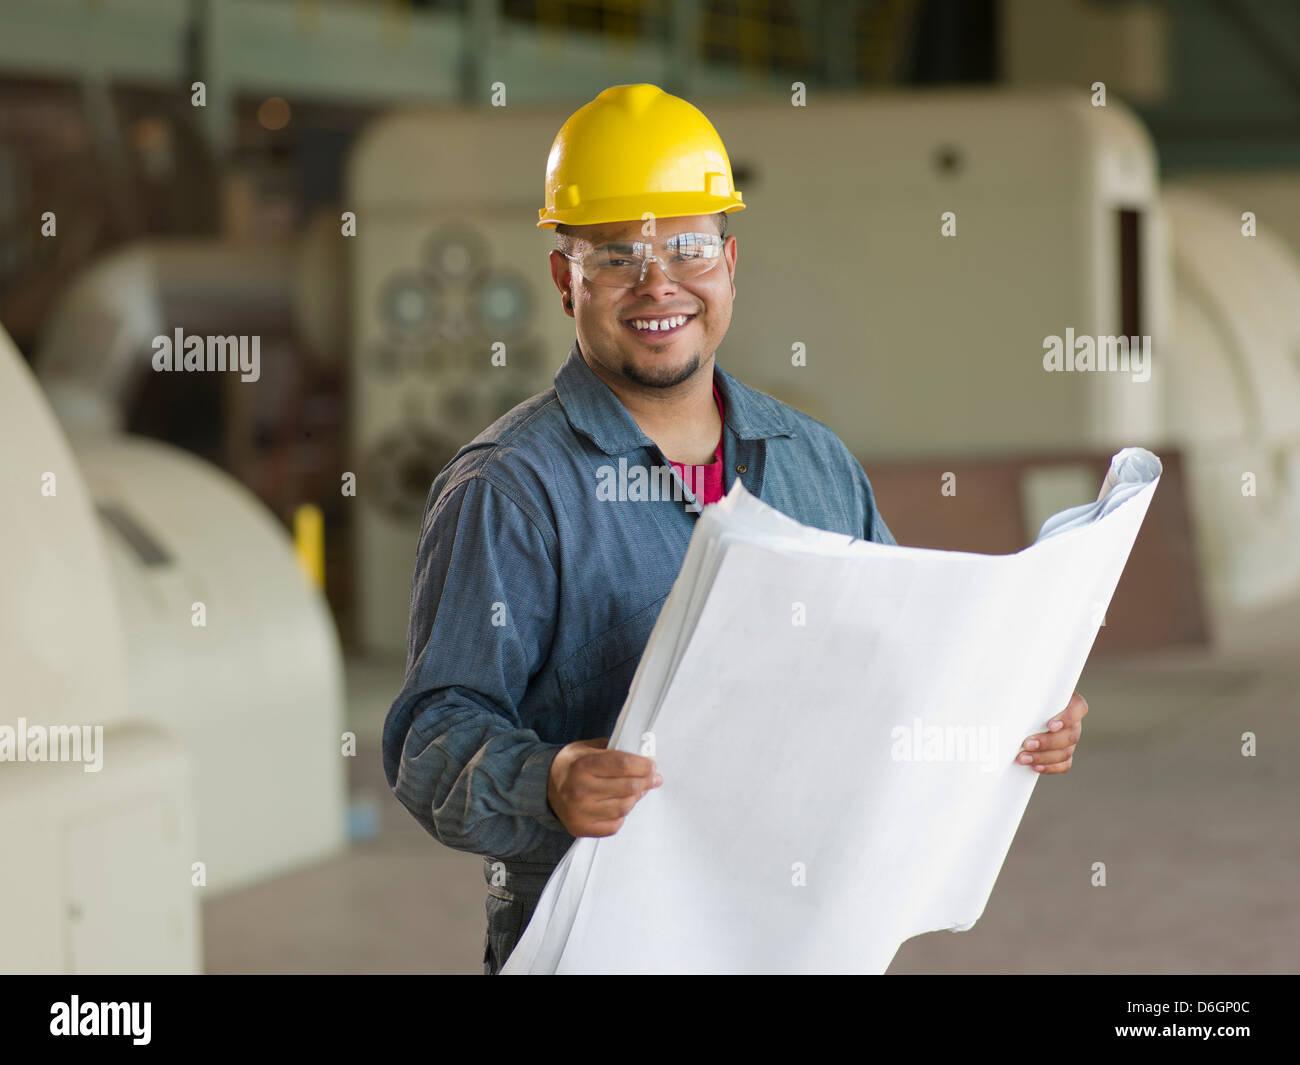 Engineer reading blueprints on site - Stock Image